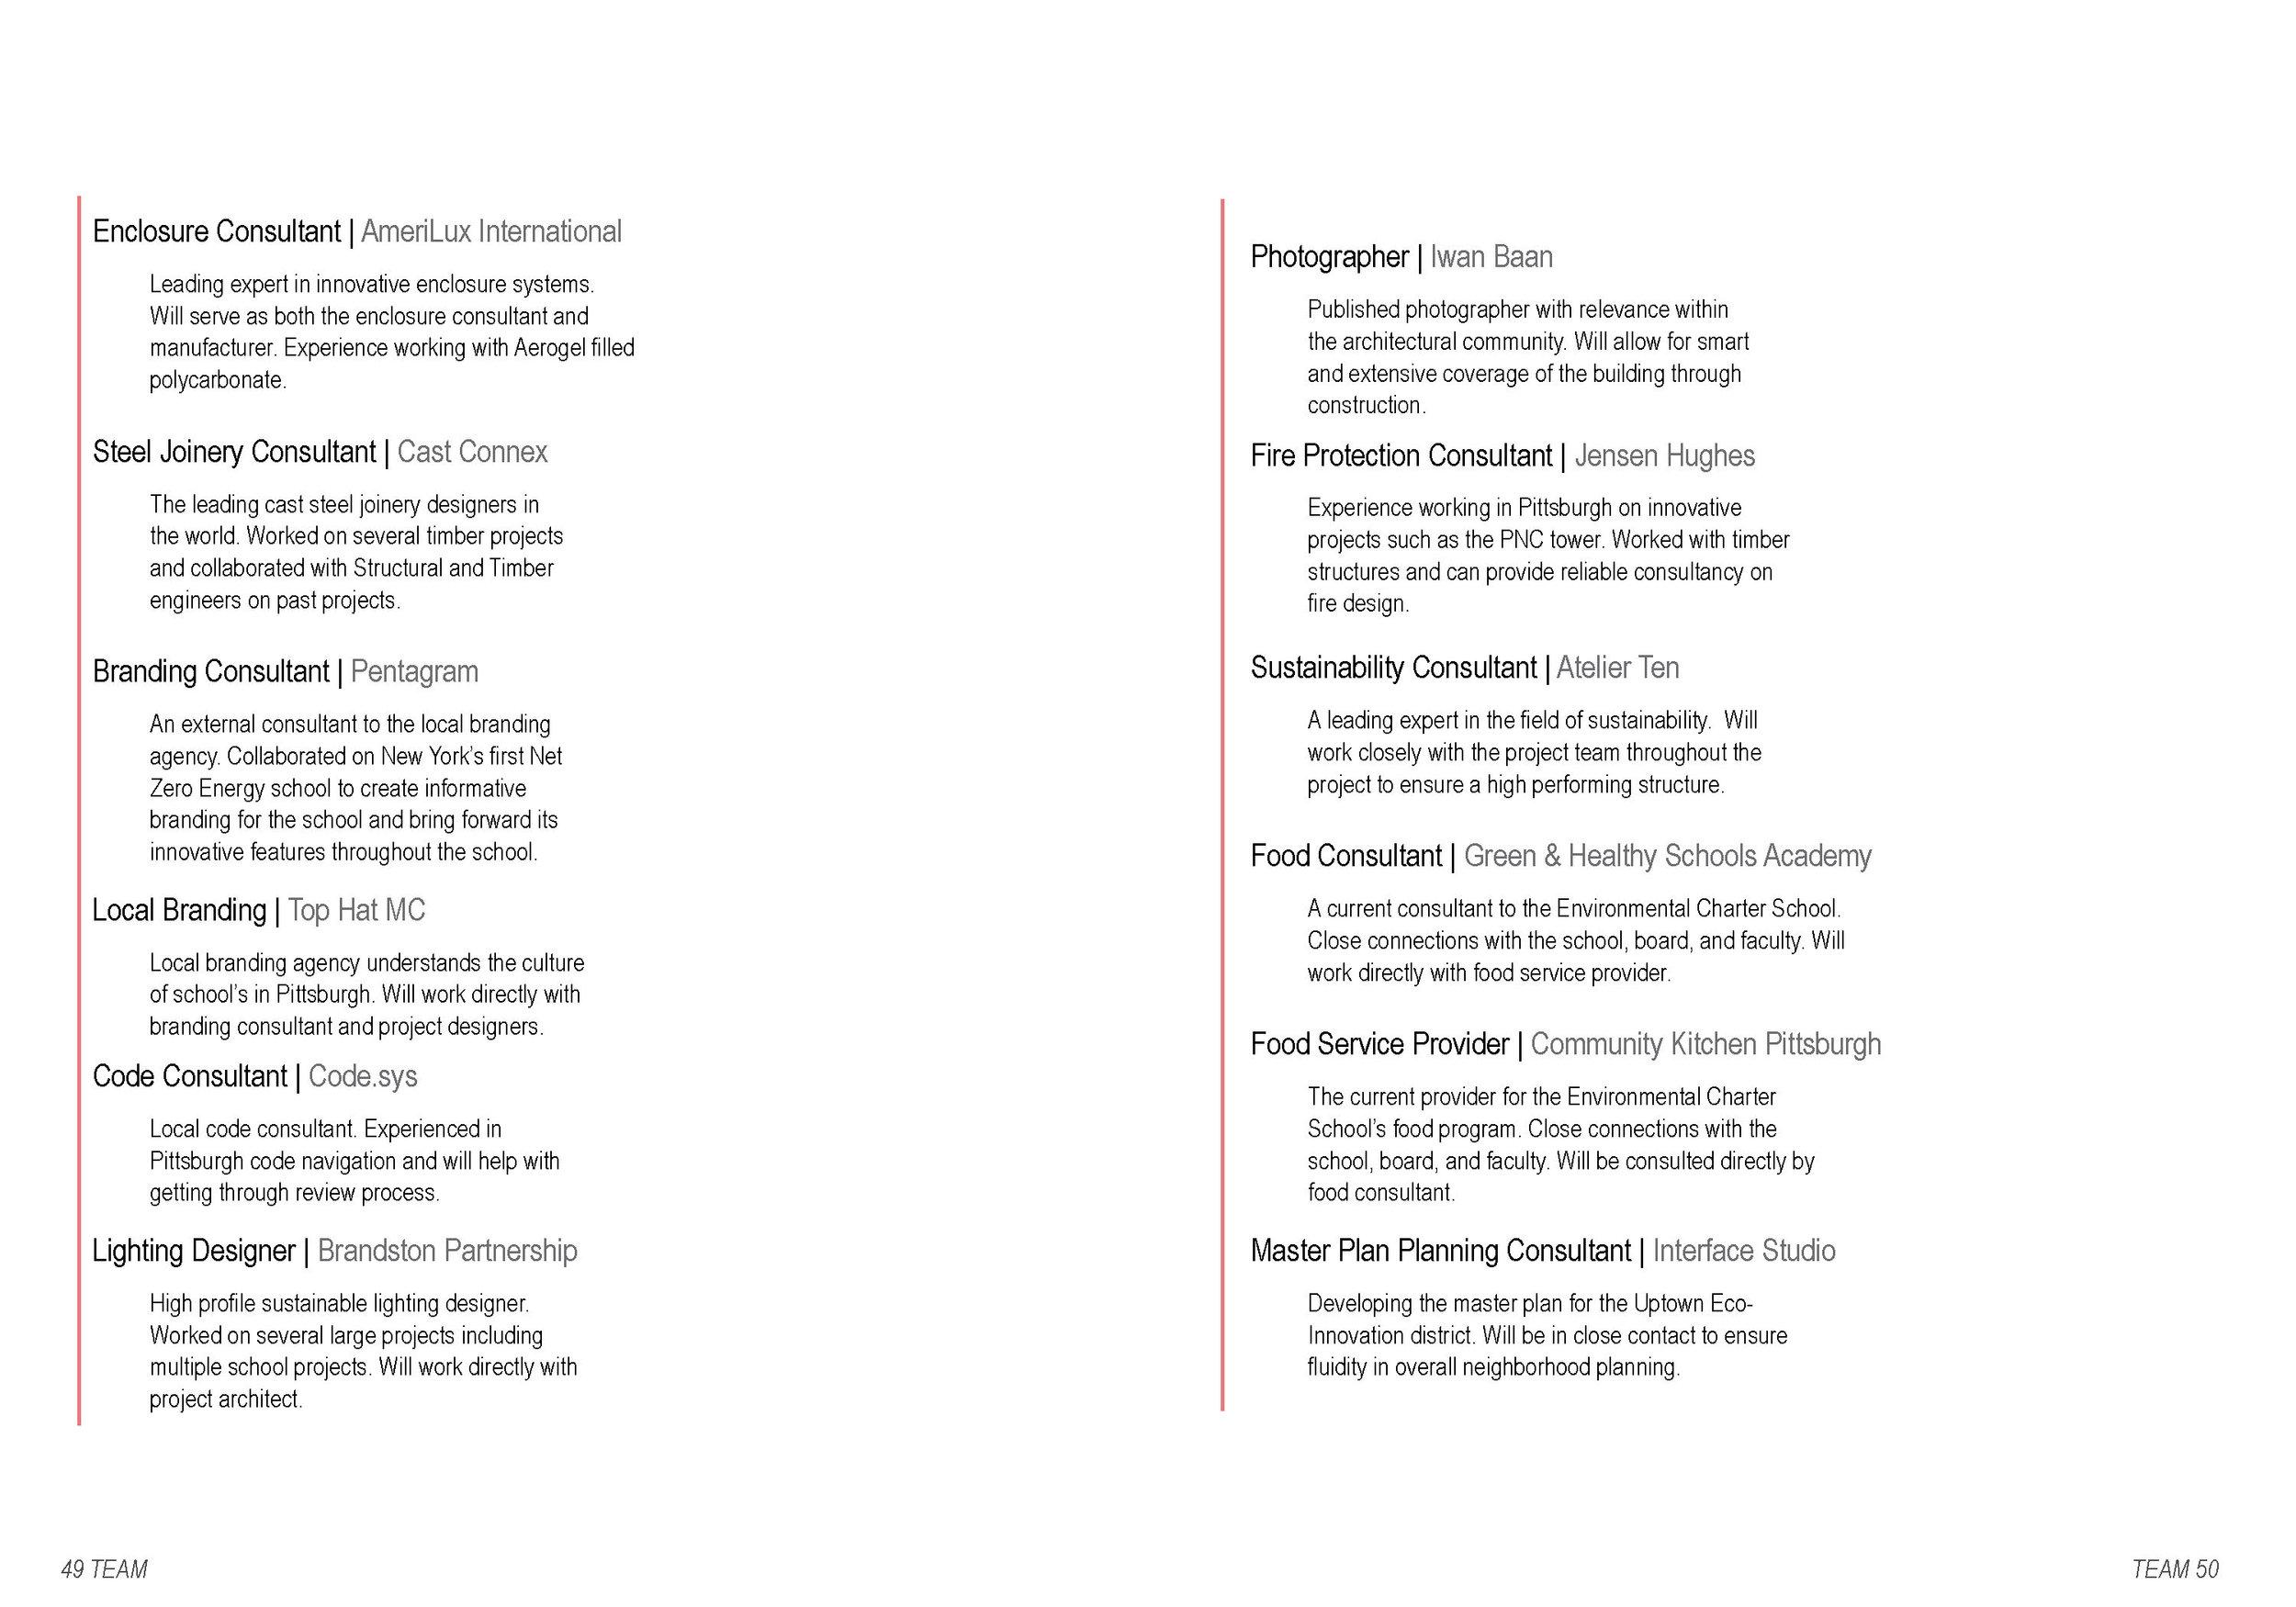 48-381_POSITION_TKHALIFA_V02_2017_05_11_SPREADS_Page_27.jpg